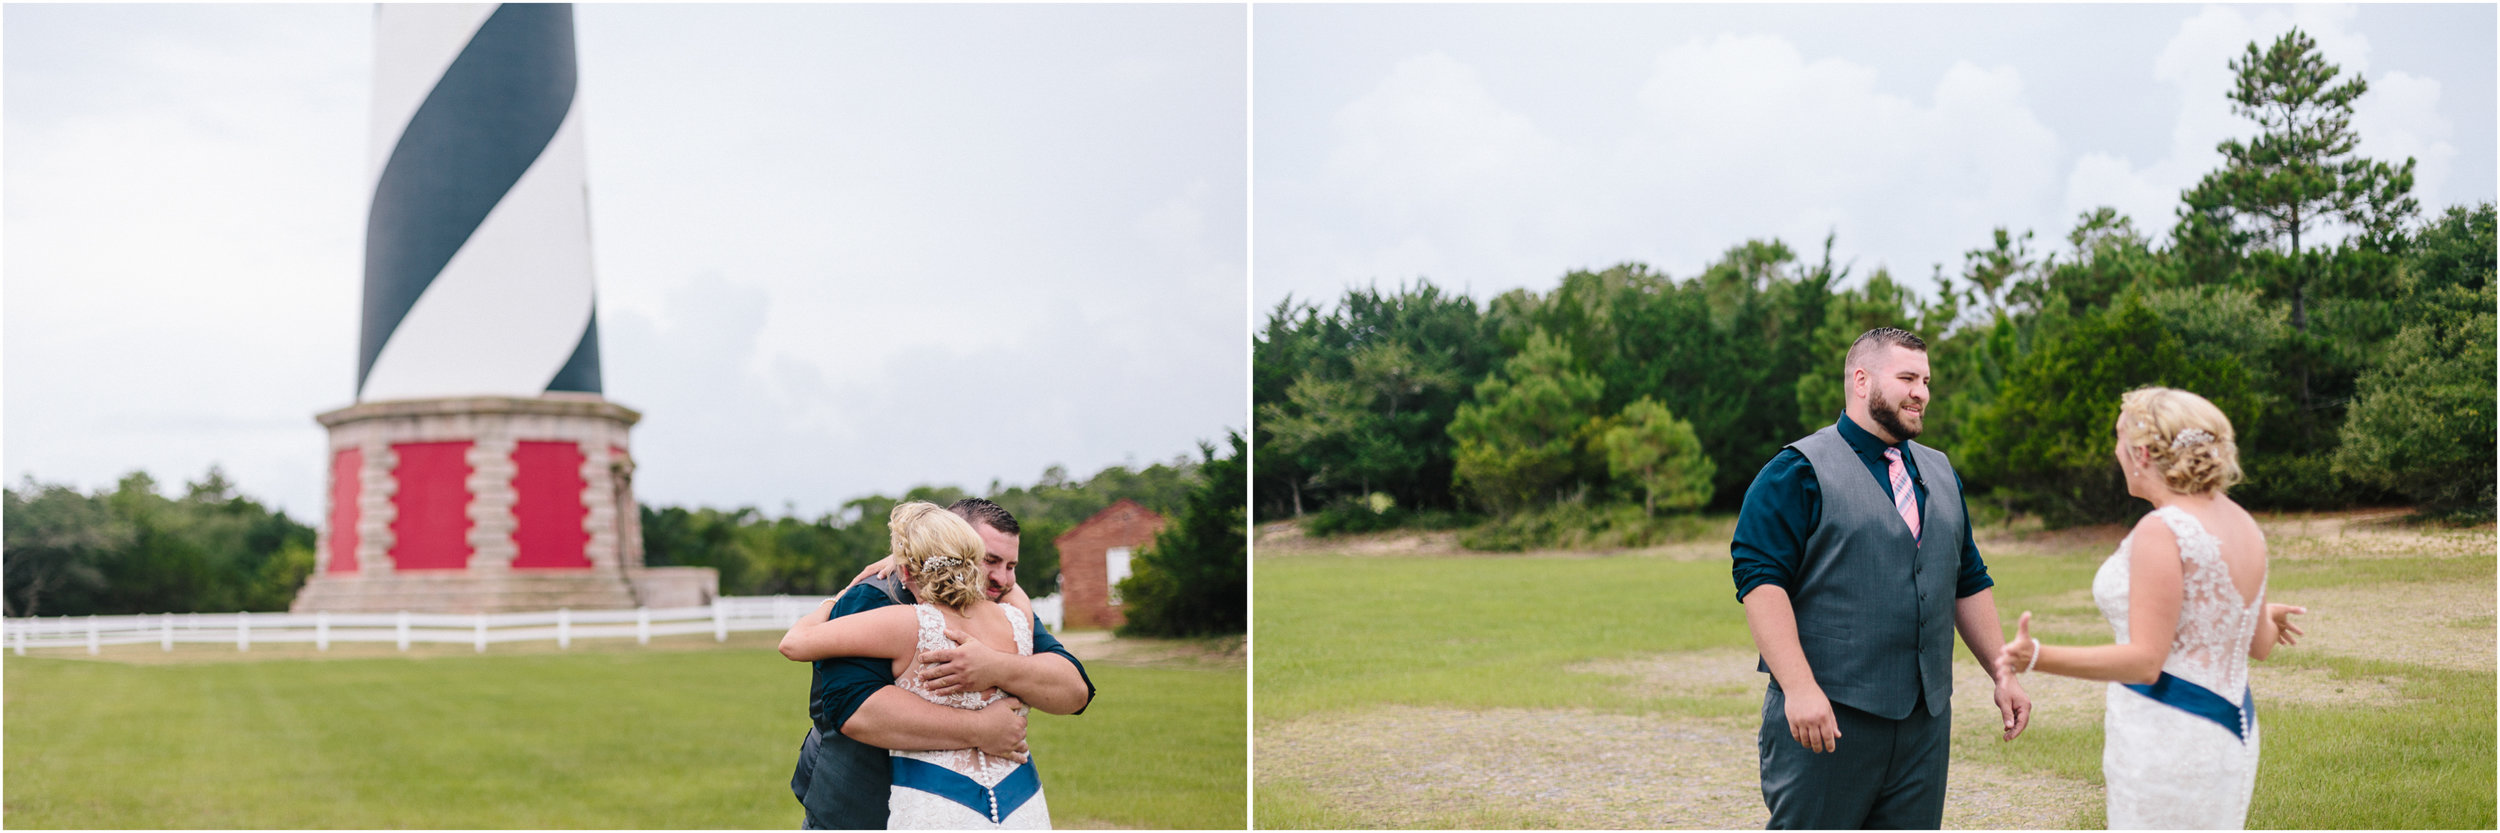 alyssa barletter photography buxton north carolina outer banks obx cape hatteras elopement intmate beach wedding-18.jpg